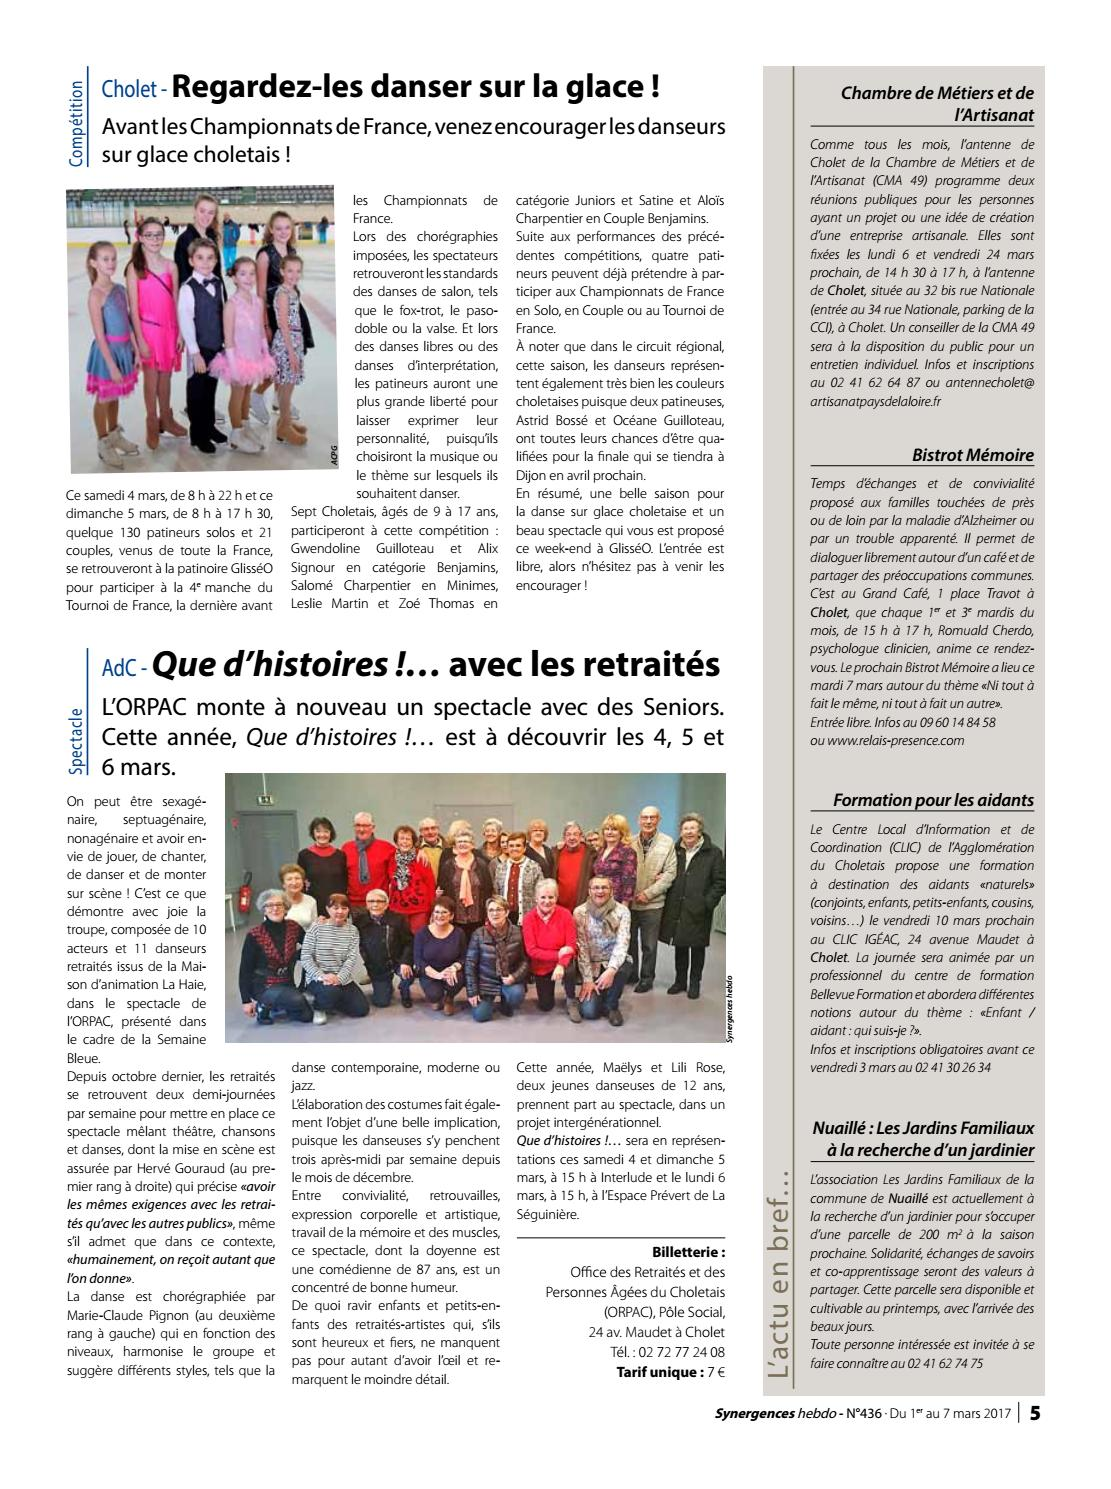 synergences hebdo n°436 by agglomération du choletais - issuu